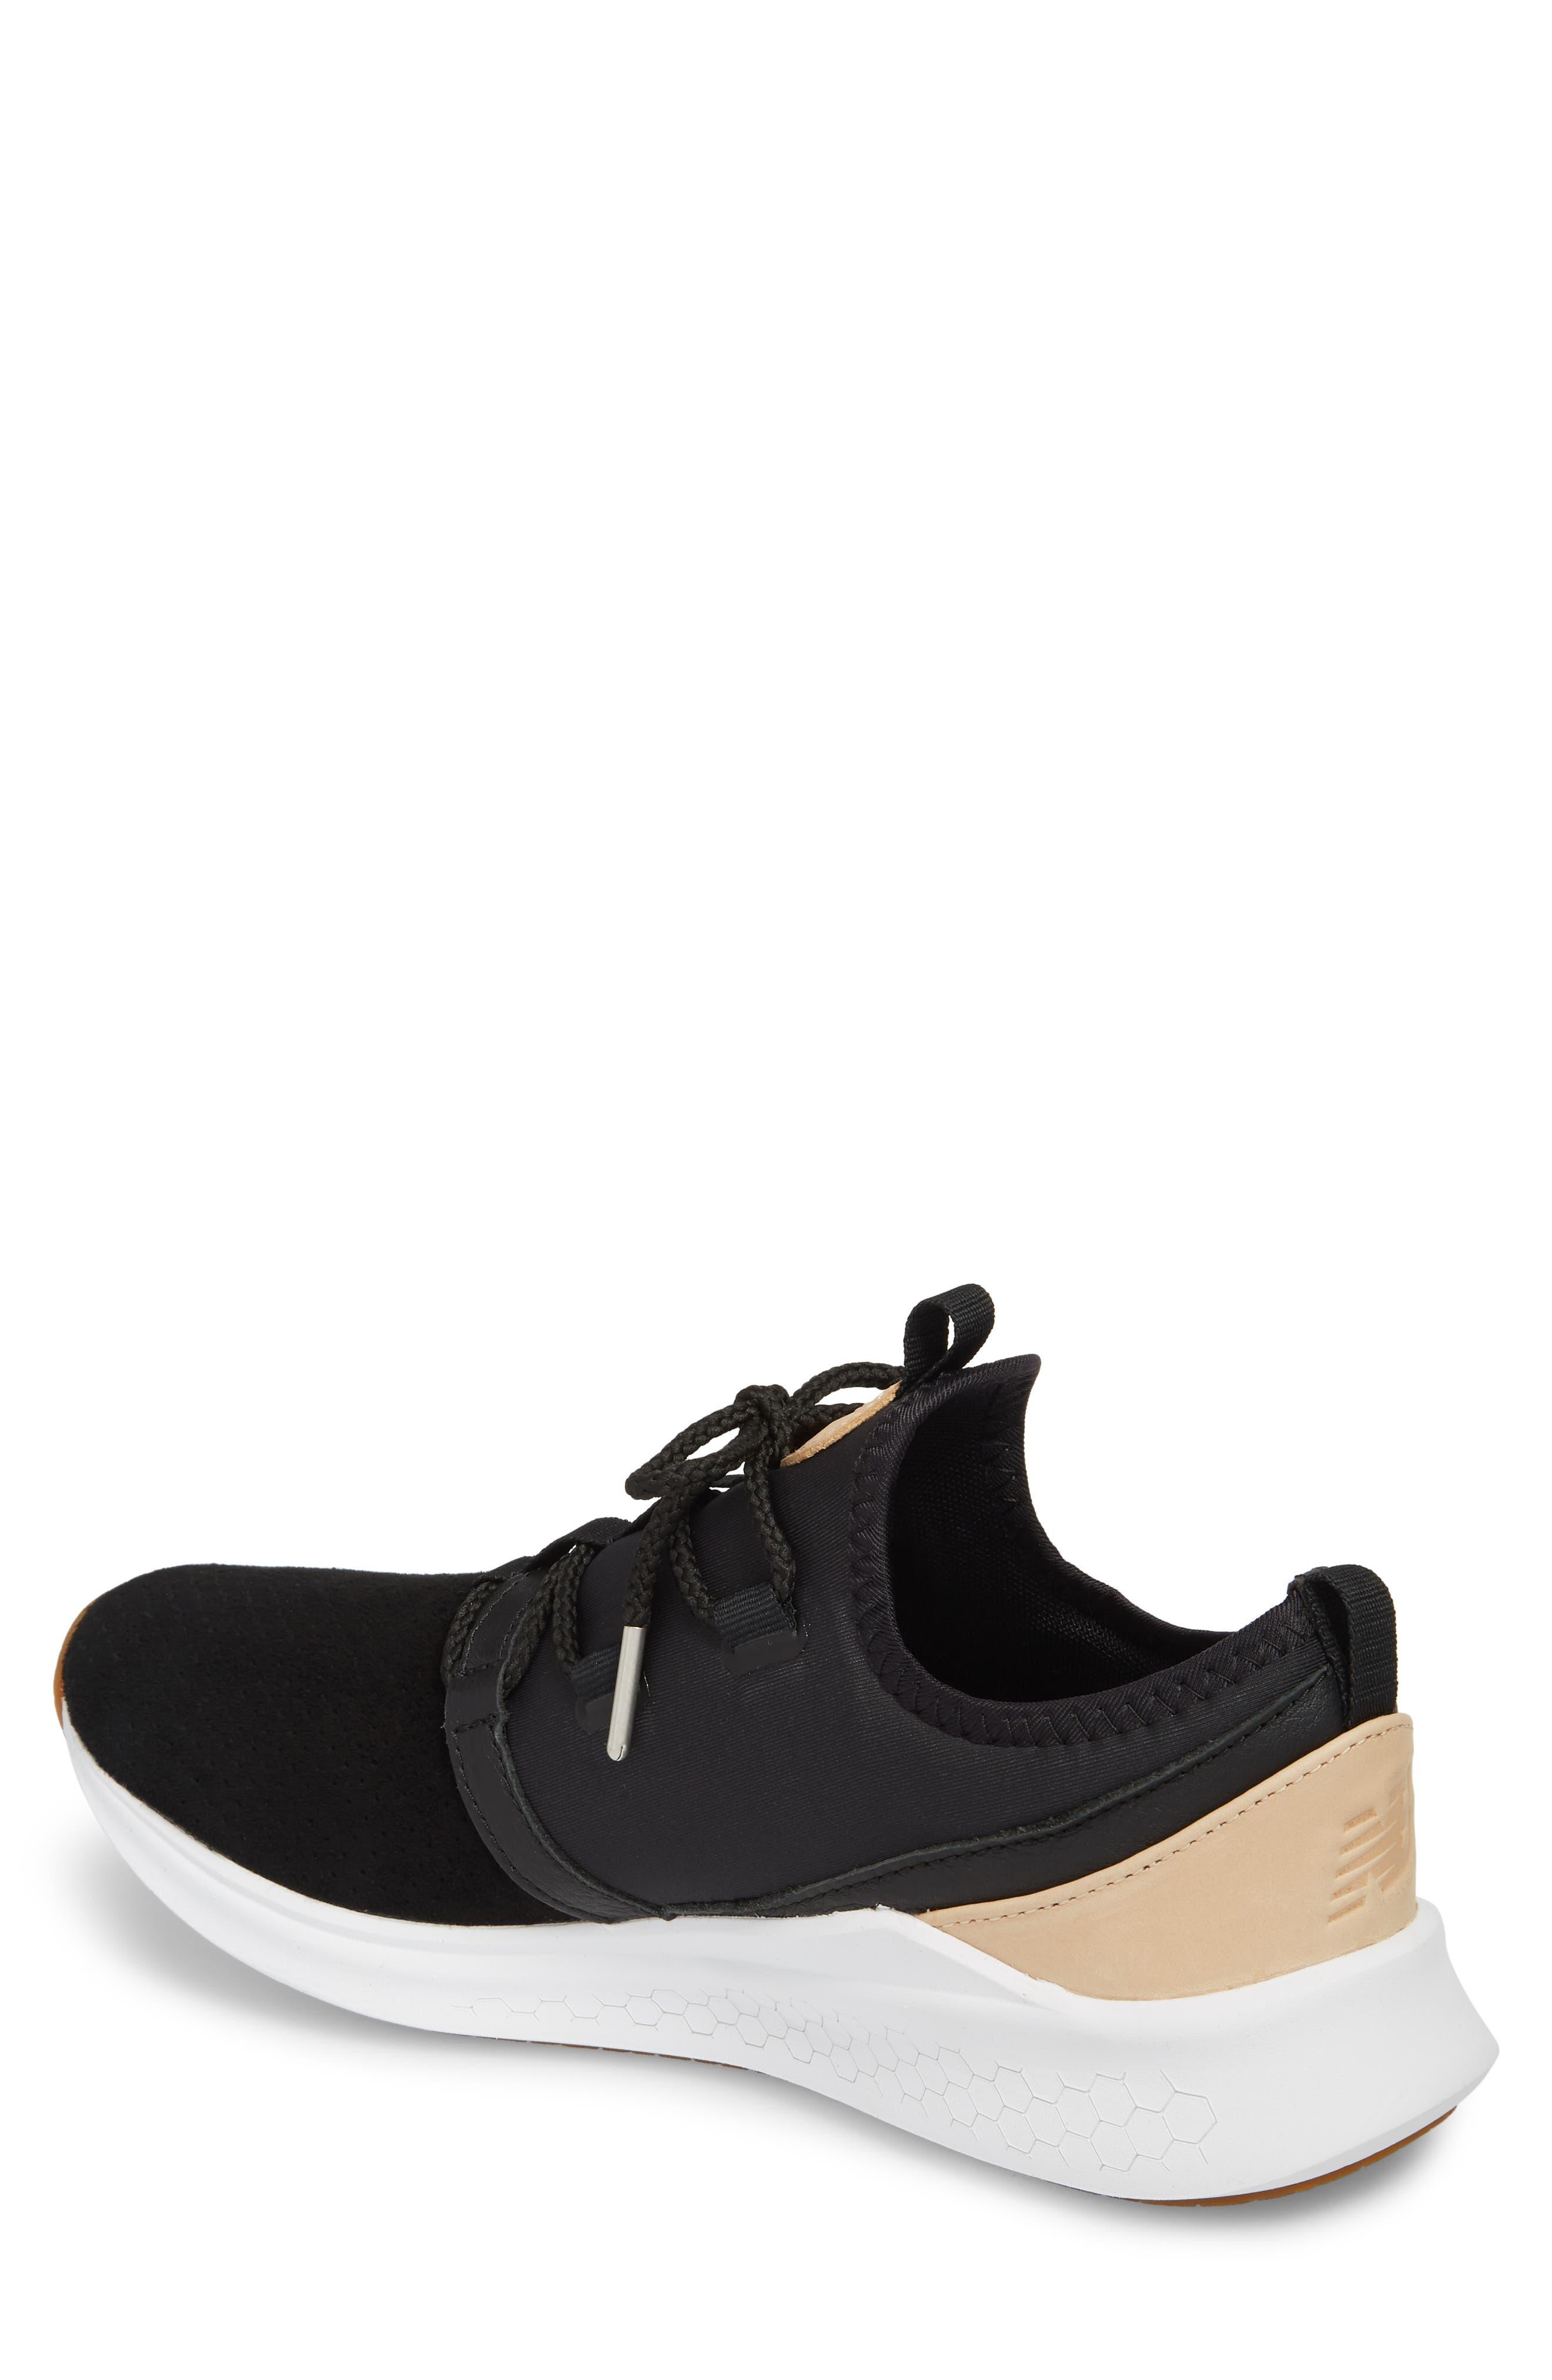 Fresh Foam Laser Luxe Sneaker,                             Alternate thumbnail 2, color,                             001